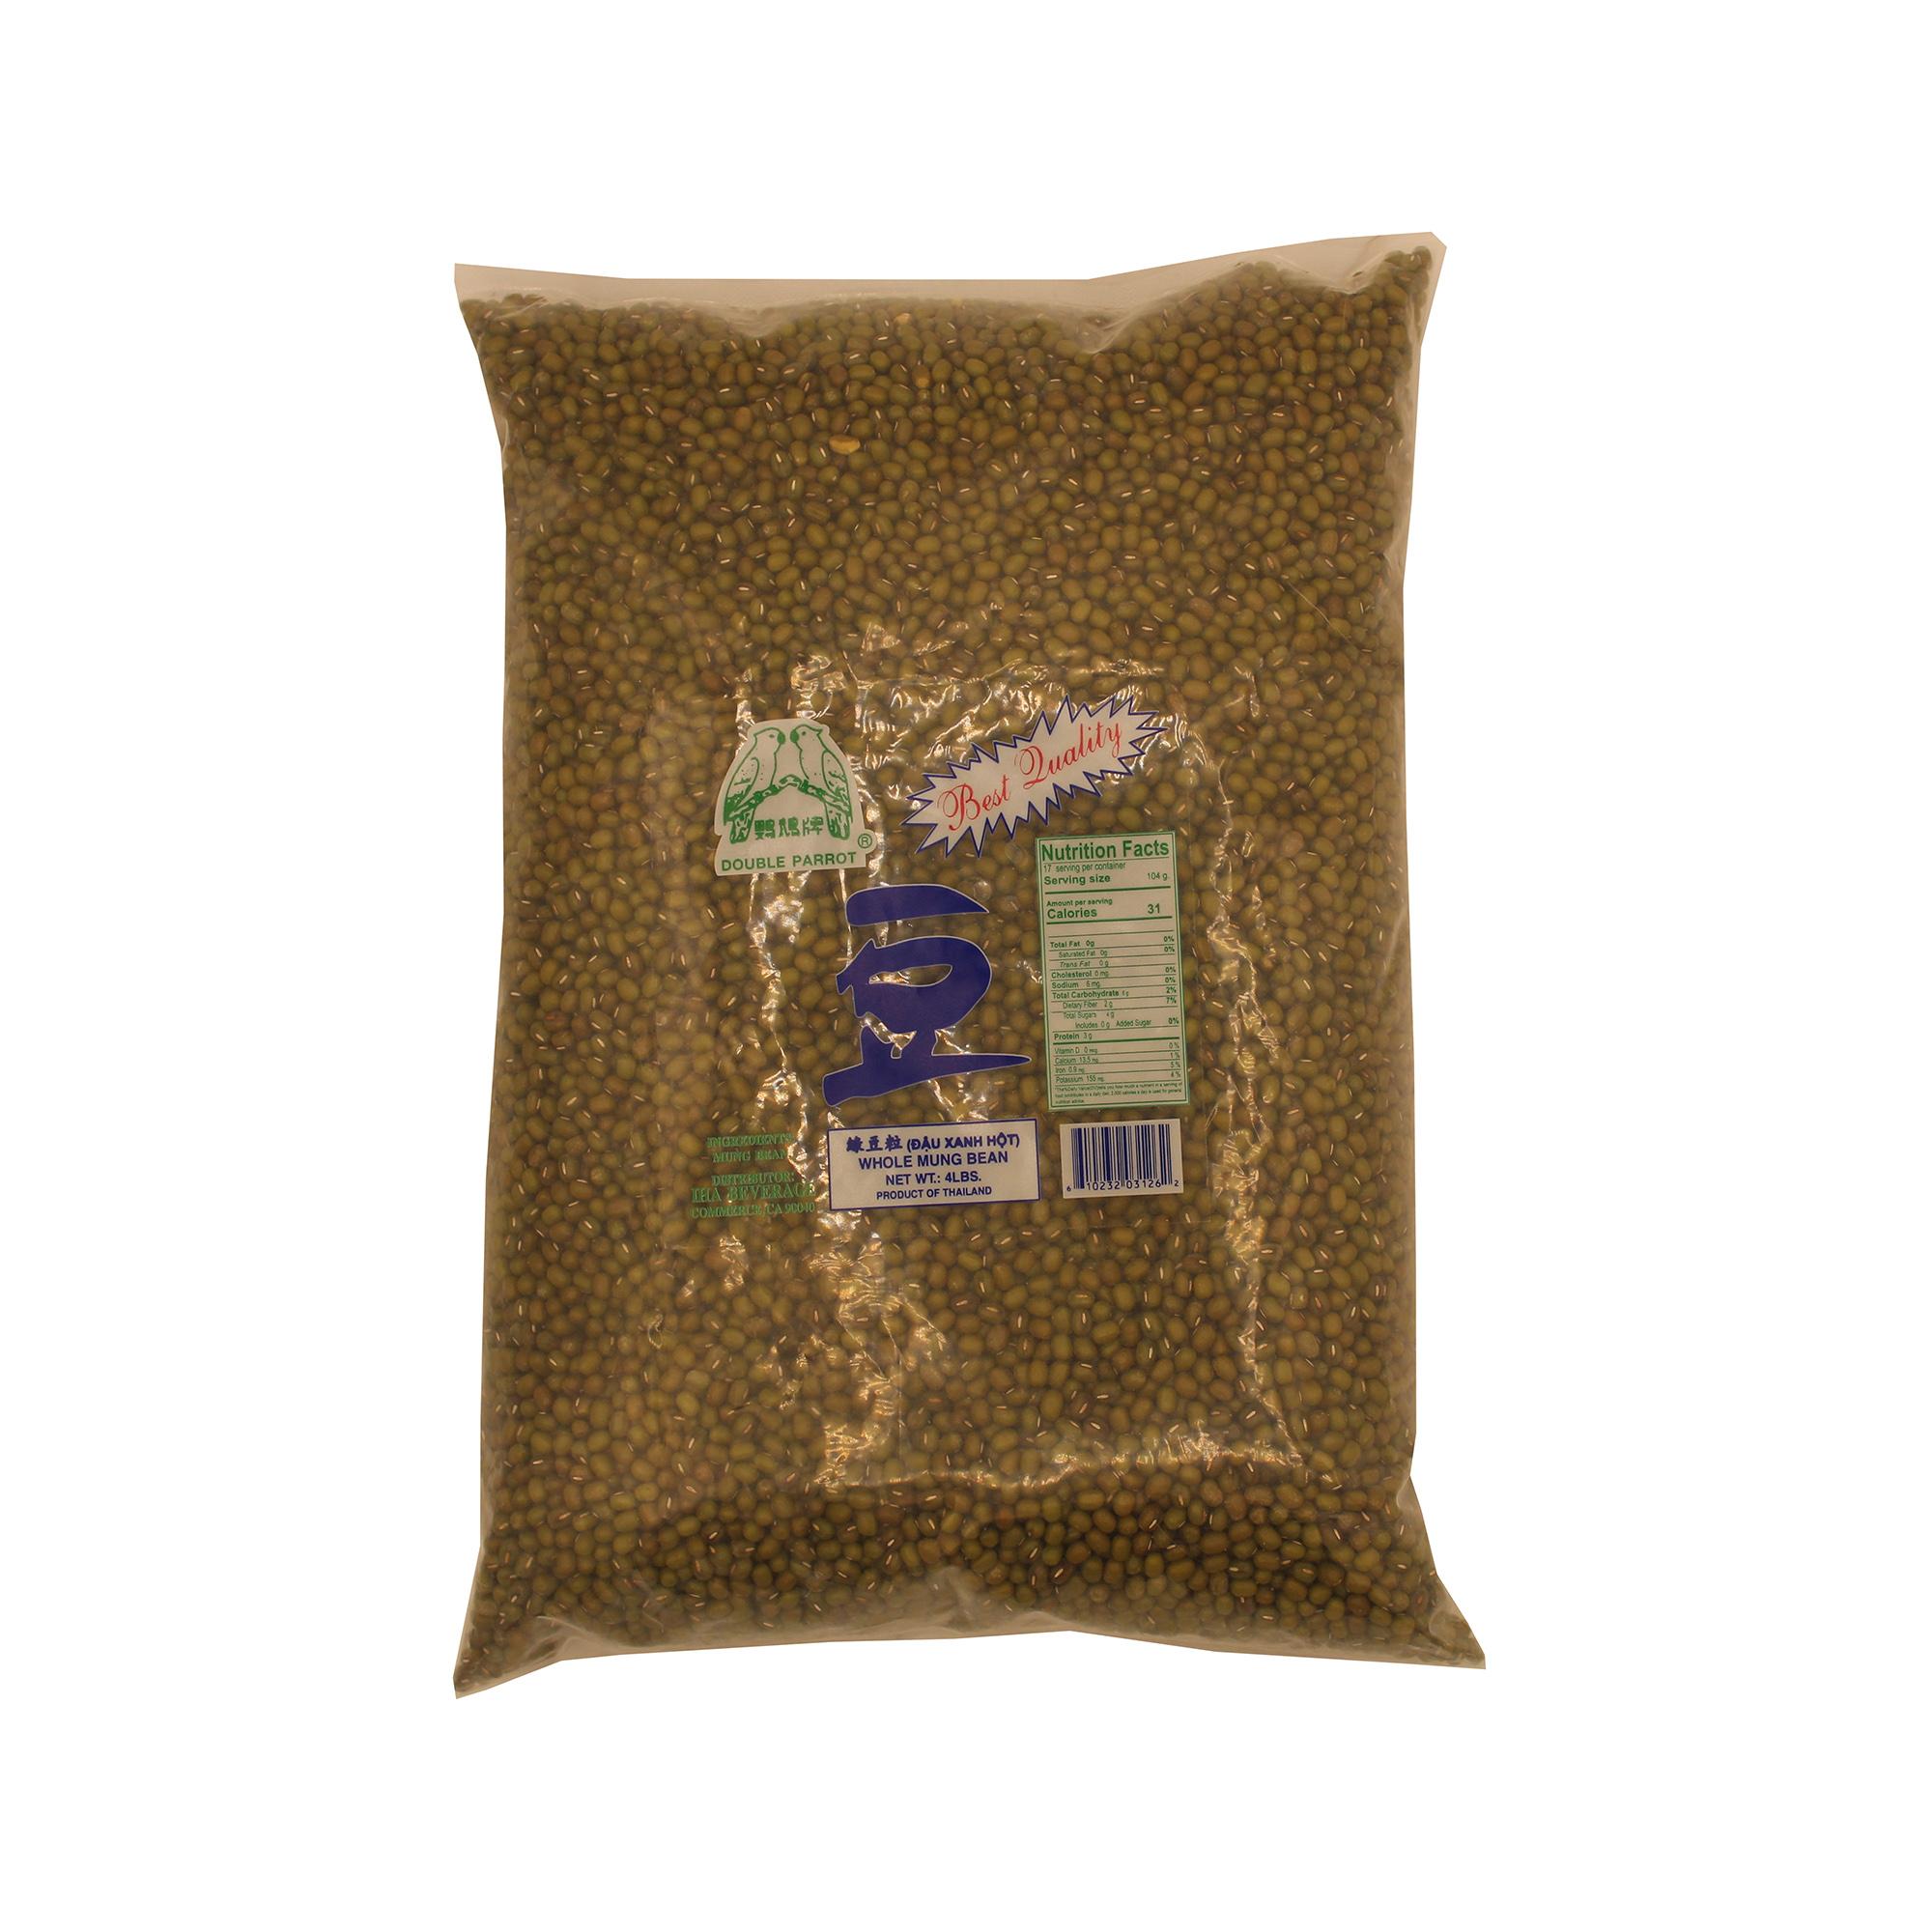 DOUBLE PARROT Whole Mung Bean / Dau Xanh Hot 4 LB